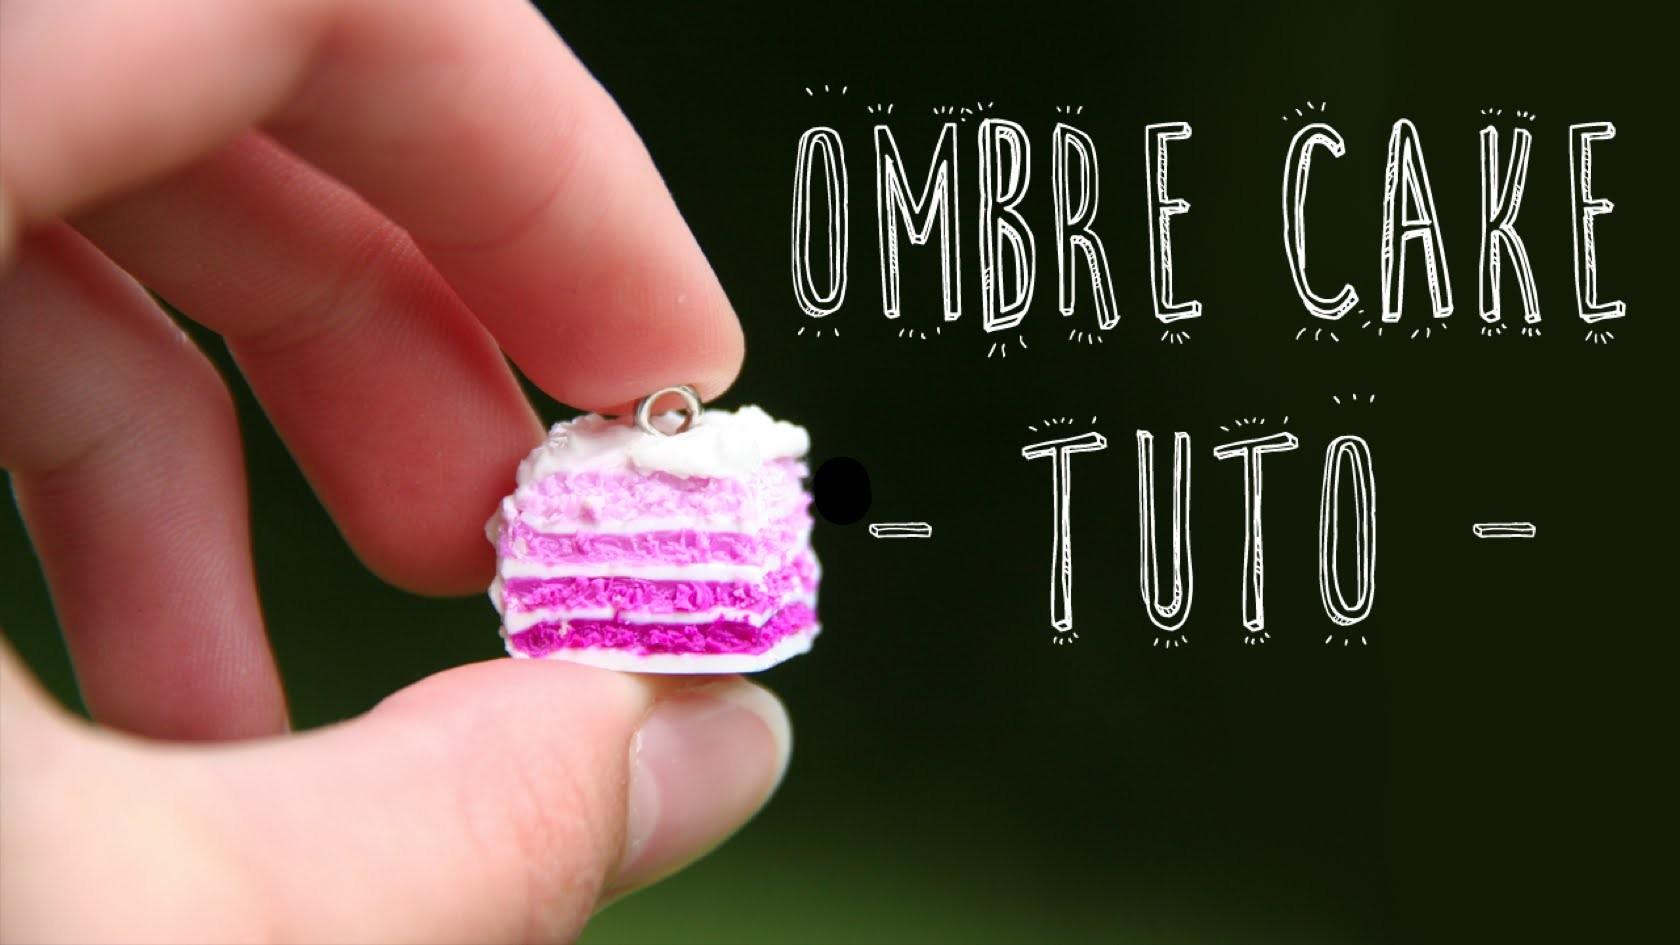 Tuto Fimo - Ombré cake | Polymer clay tutorial - Ombre cake